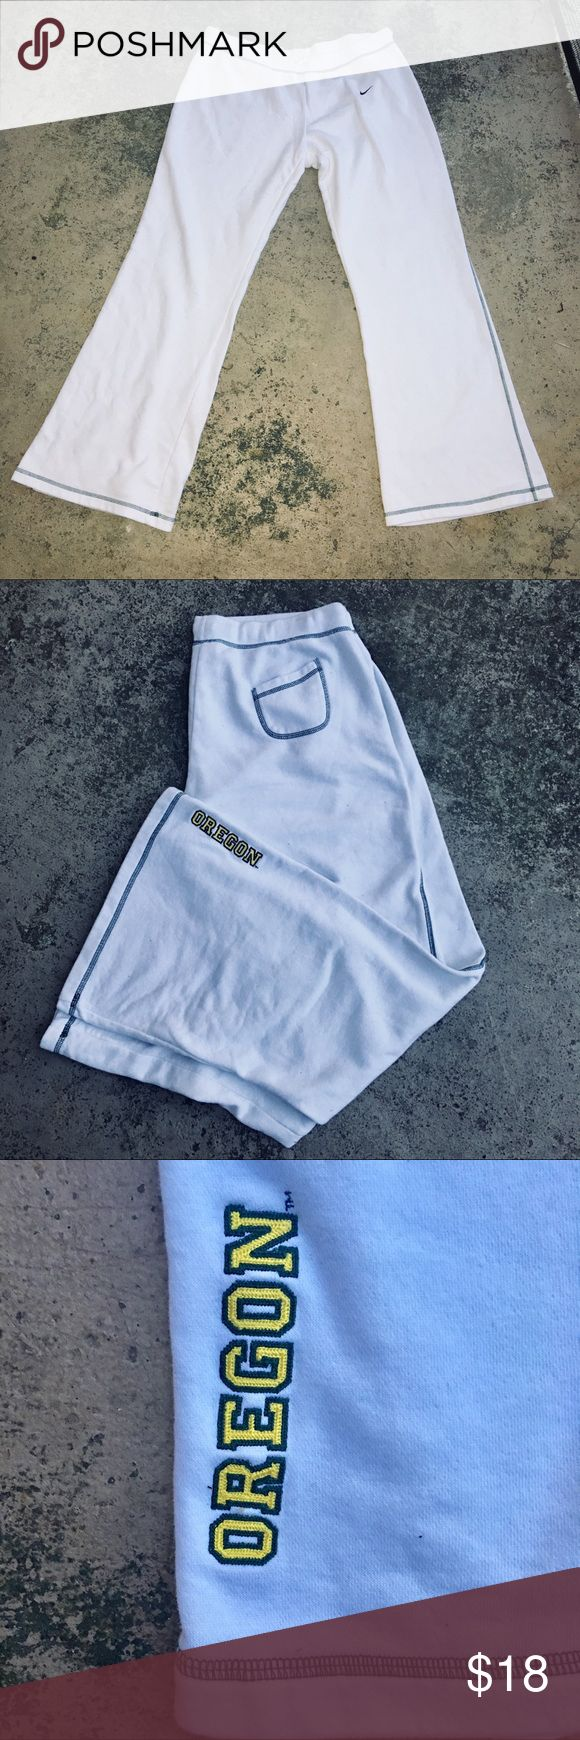 Nike Oregon Ducks White Green Sweatpants Pants Wide leg super soft white jogger sweatpants. Oregon logo on bottom back hem. Fleece lined. Loose fit. Super comfortable. Elastic waistband. One back pocket. Size XL fits size 16/18. Nike Pants